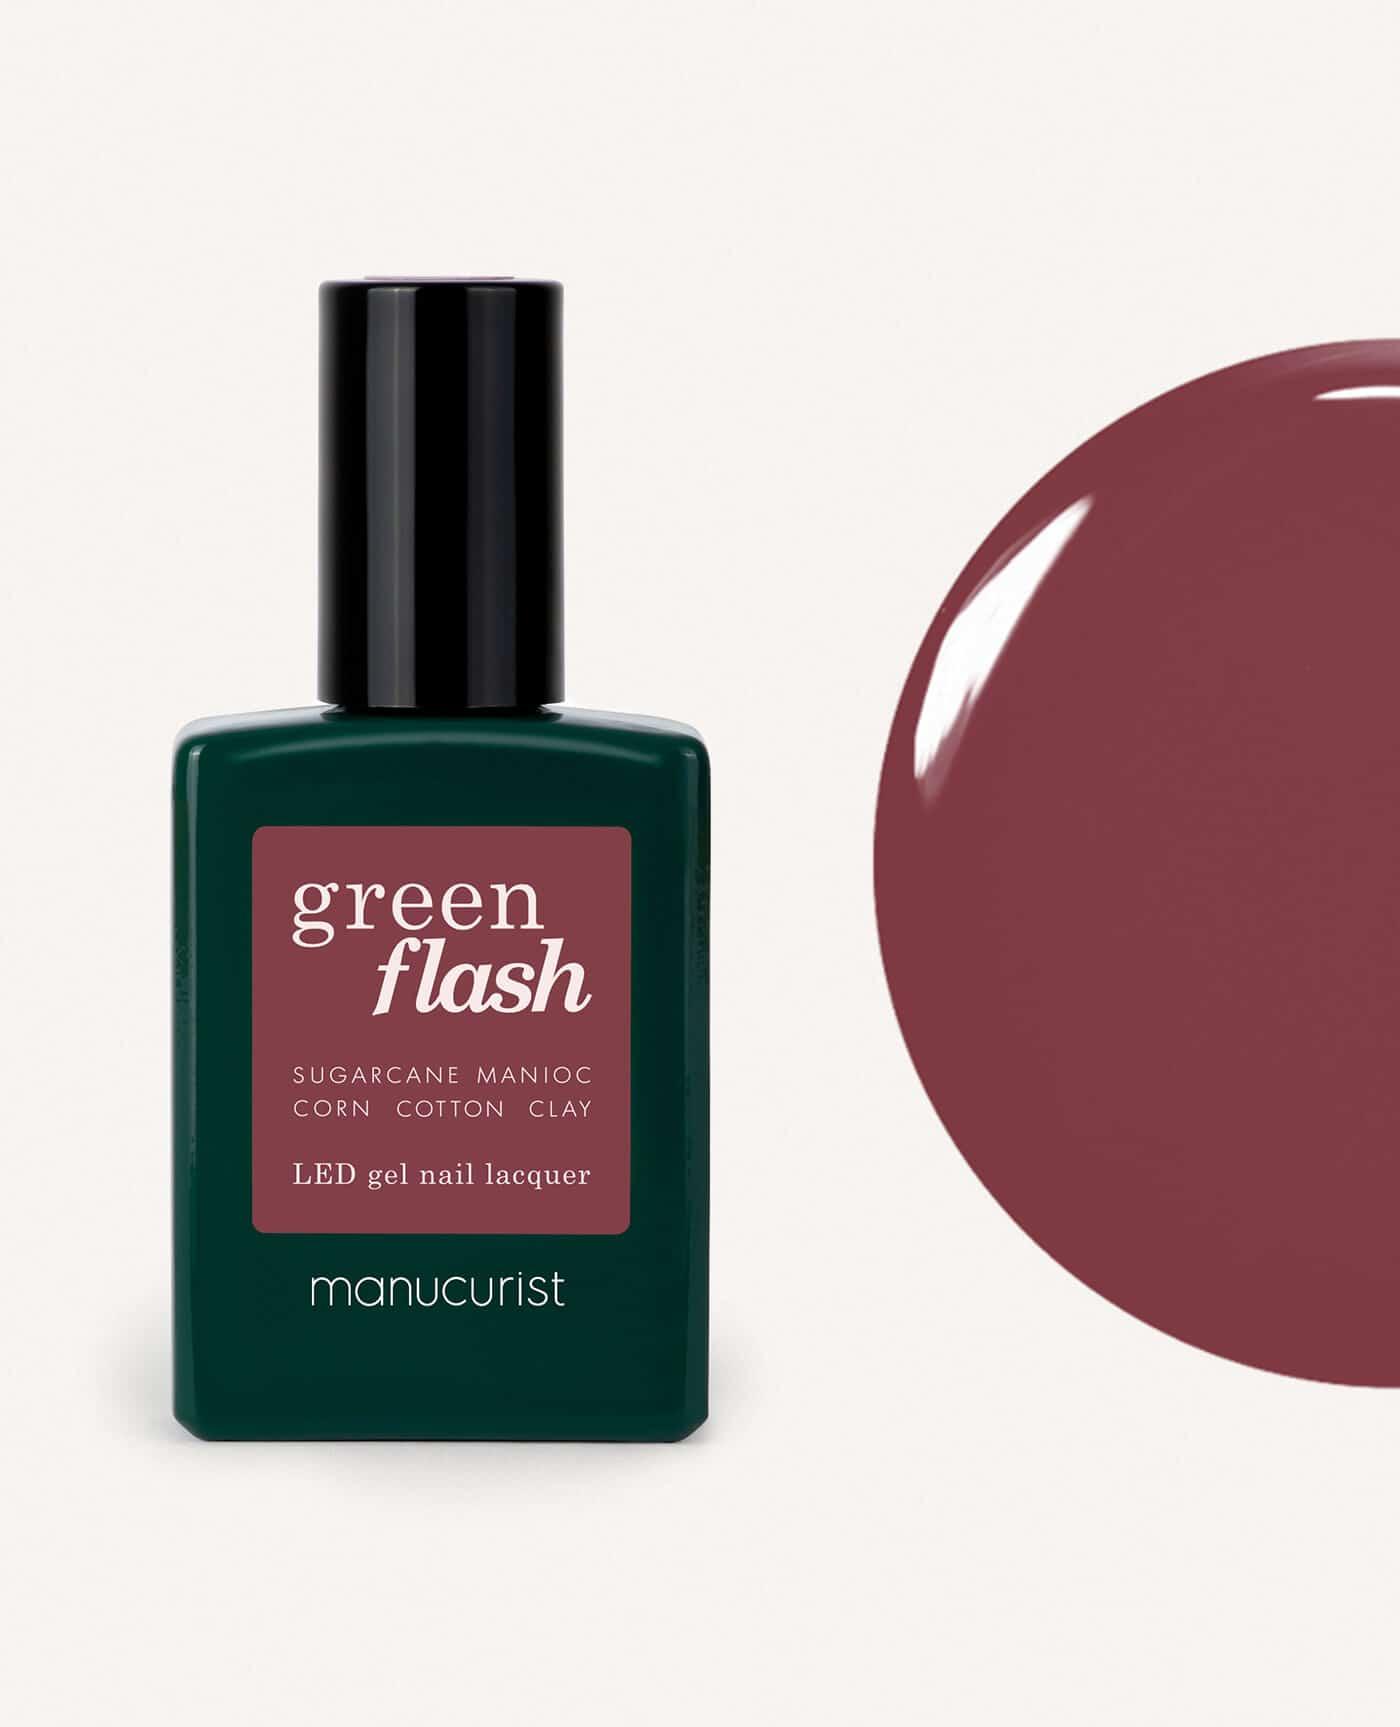 Vernis à ongles bio semi-permanent green flash de la marque Manucurist made in france de couleur violet fuchsias victoria plum